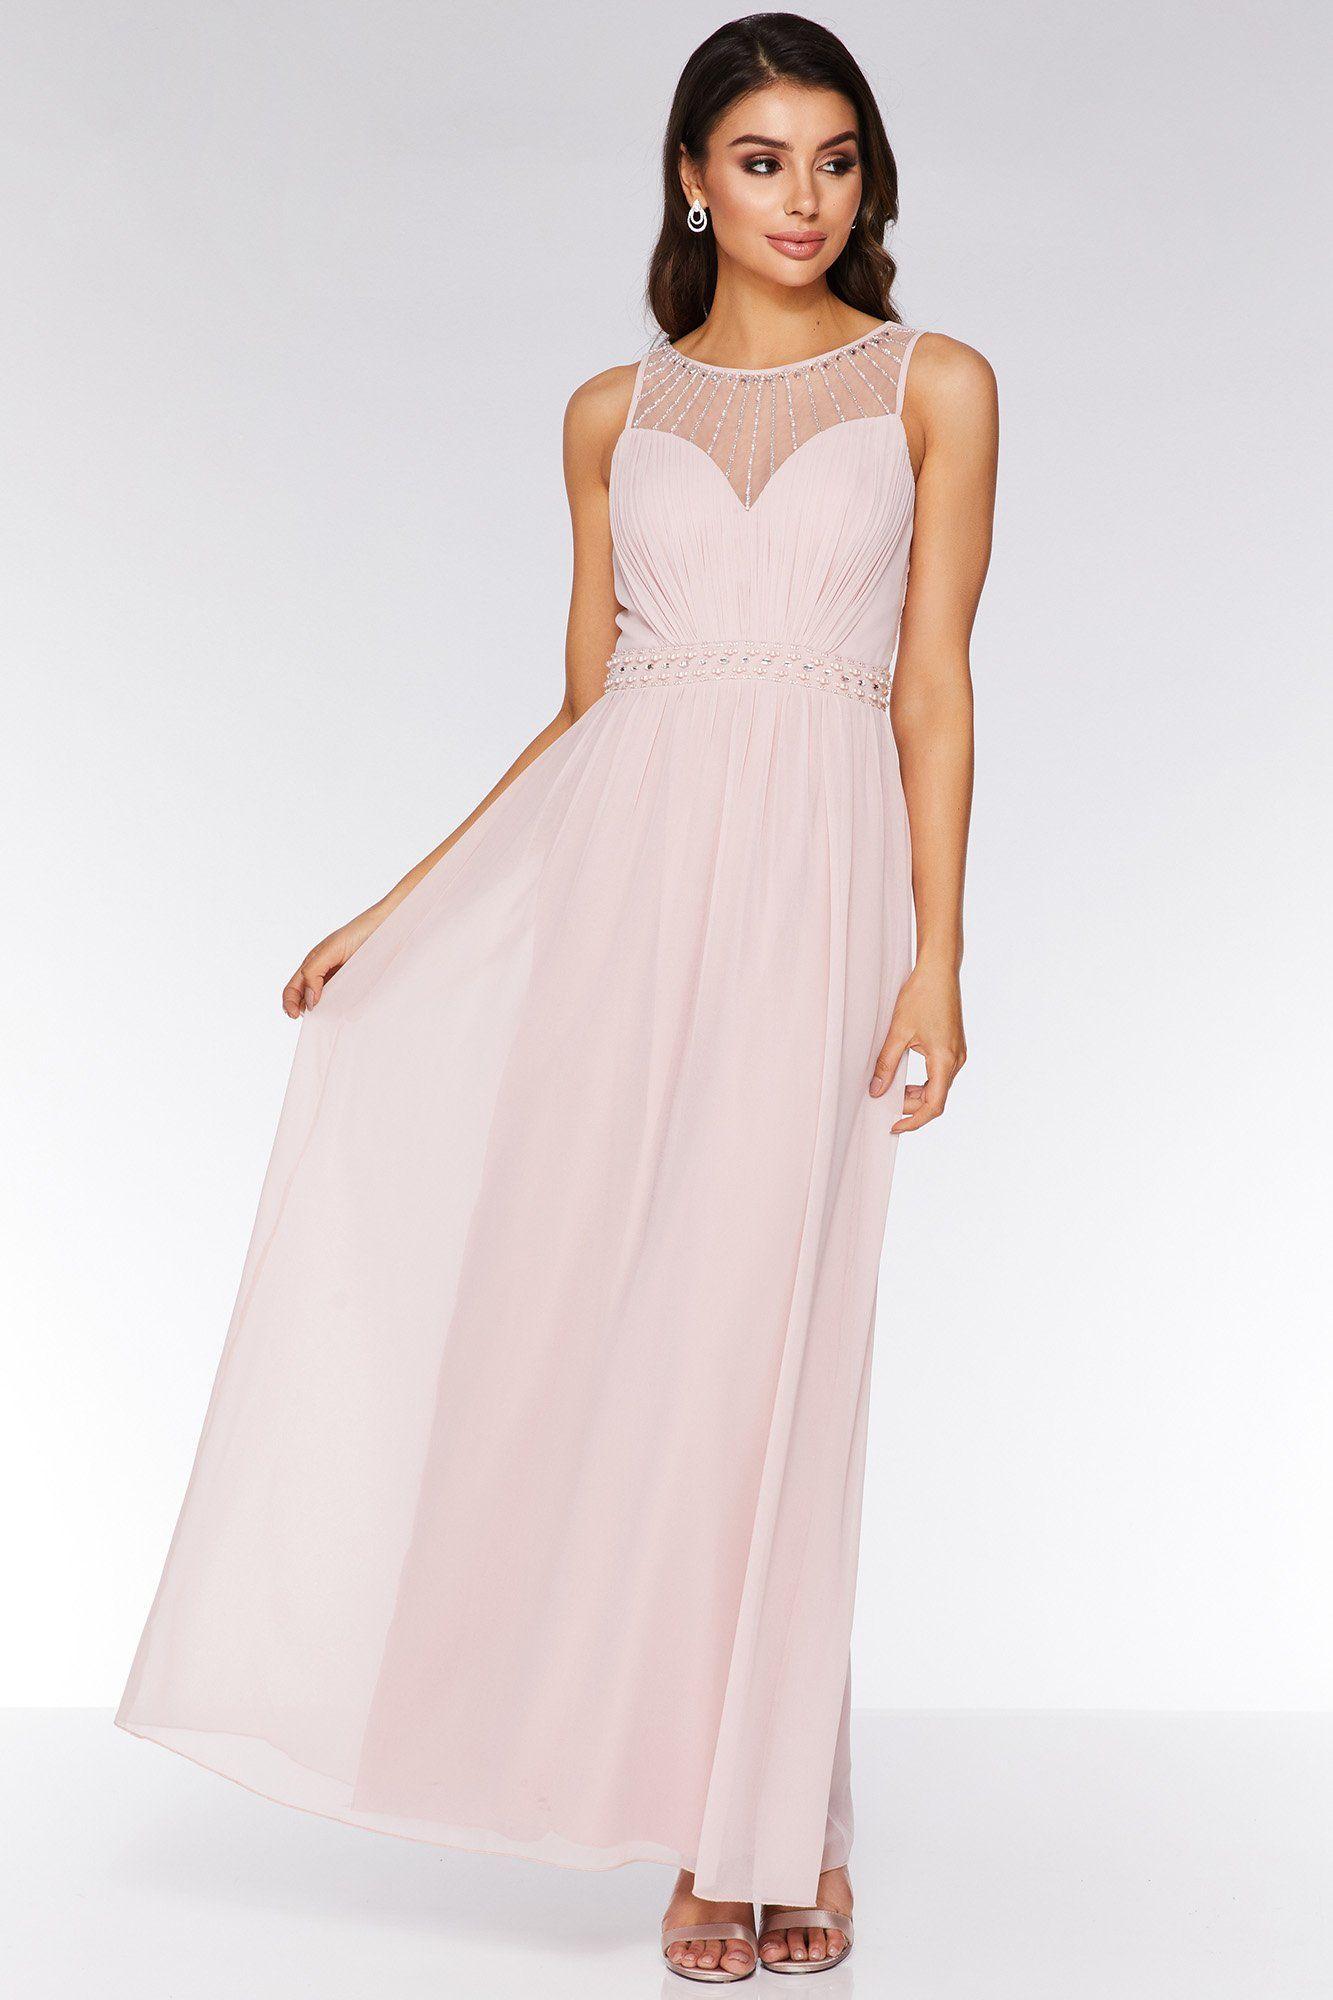 2fdd95e77233ed Pink Chiffon High Neck Maxi Dress in 2019 | prom | Dresses, Chiffon ...